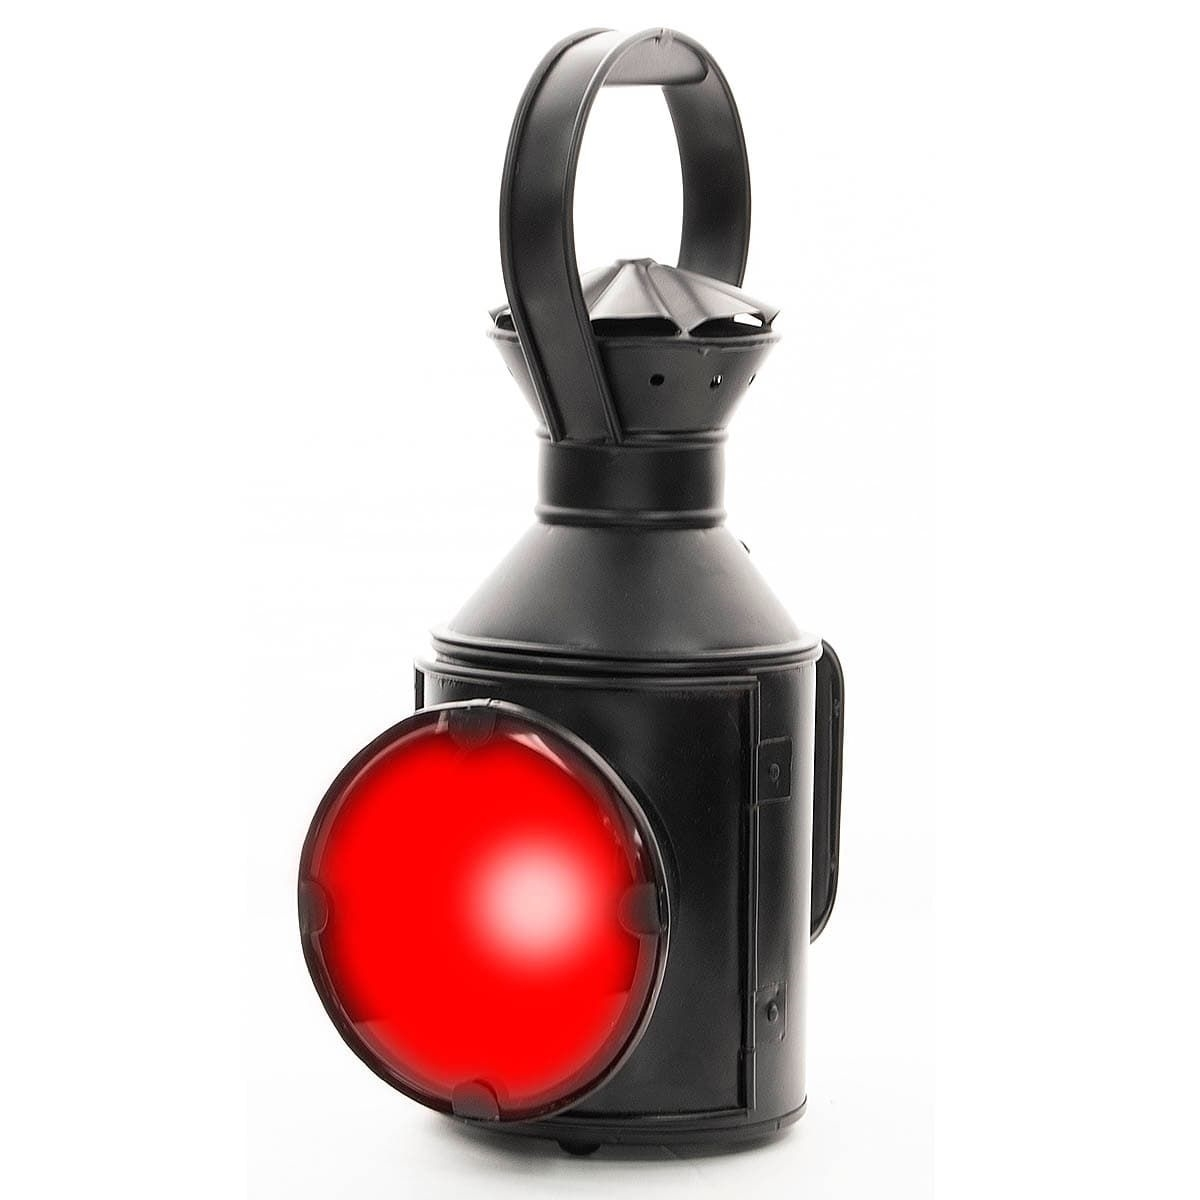 Iron Kerosene Railroad Lantern with Red Lens